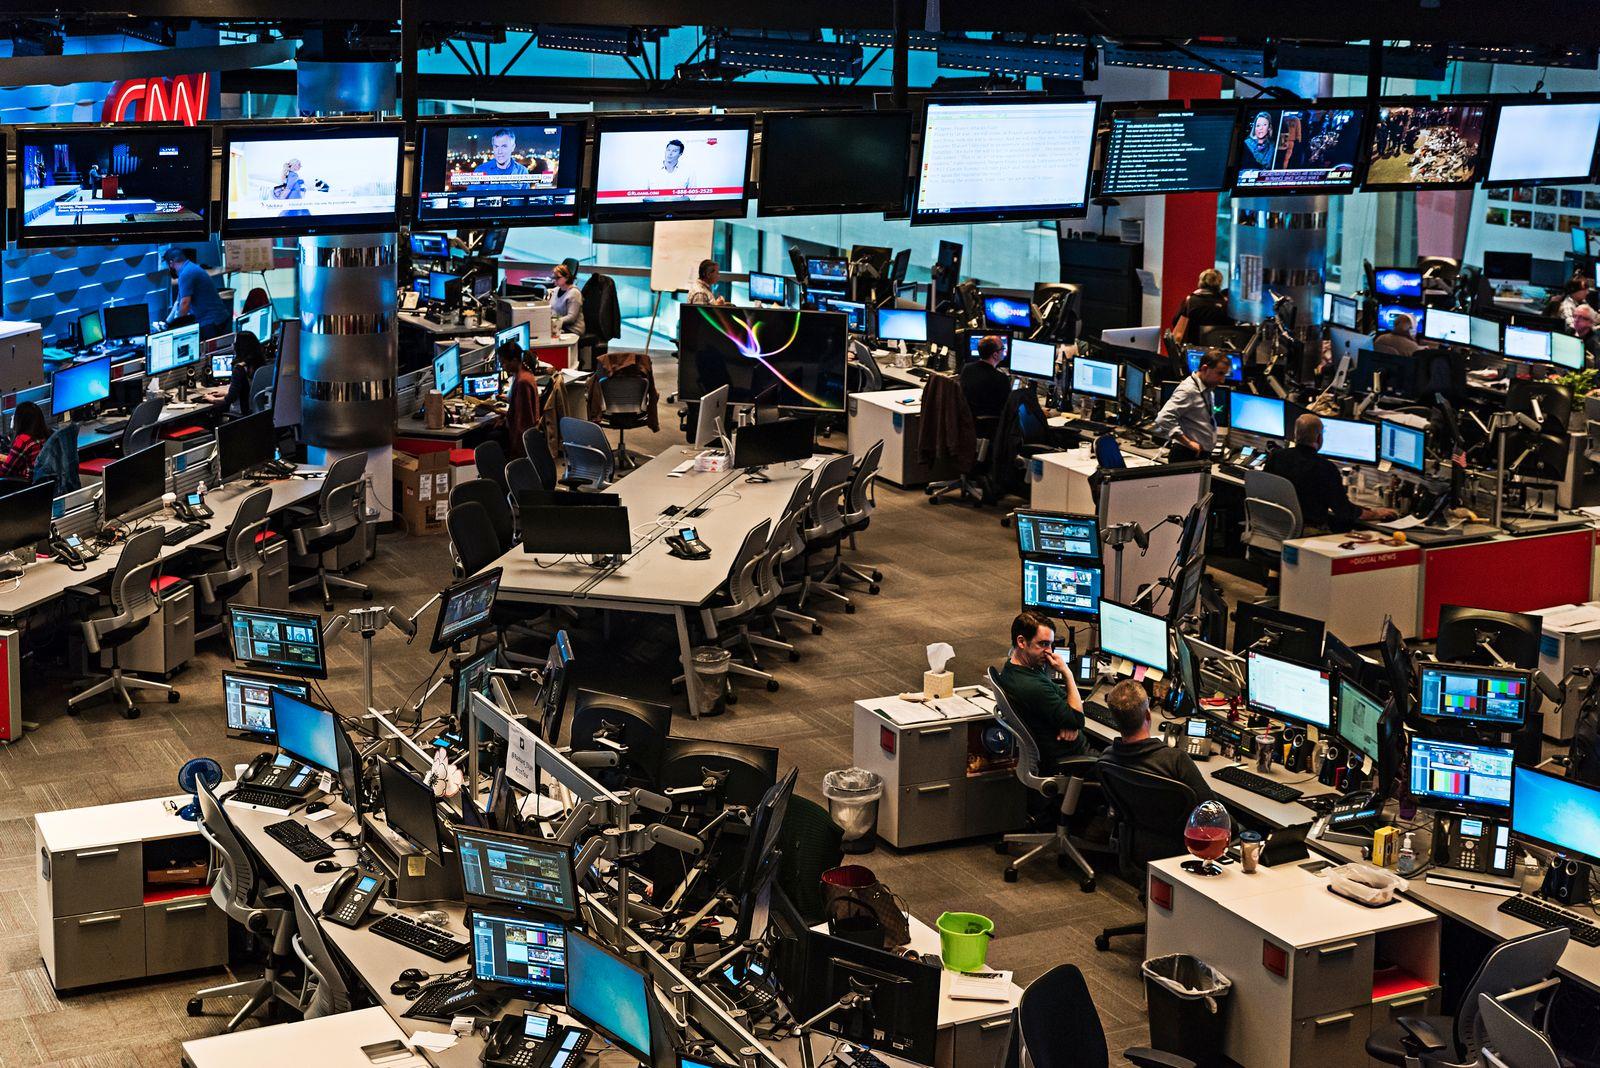 Newsroom at CNN World Headquarters